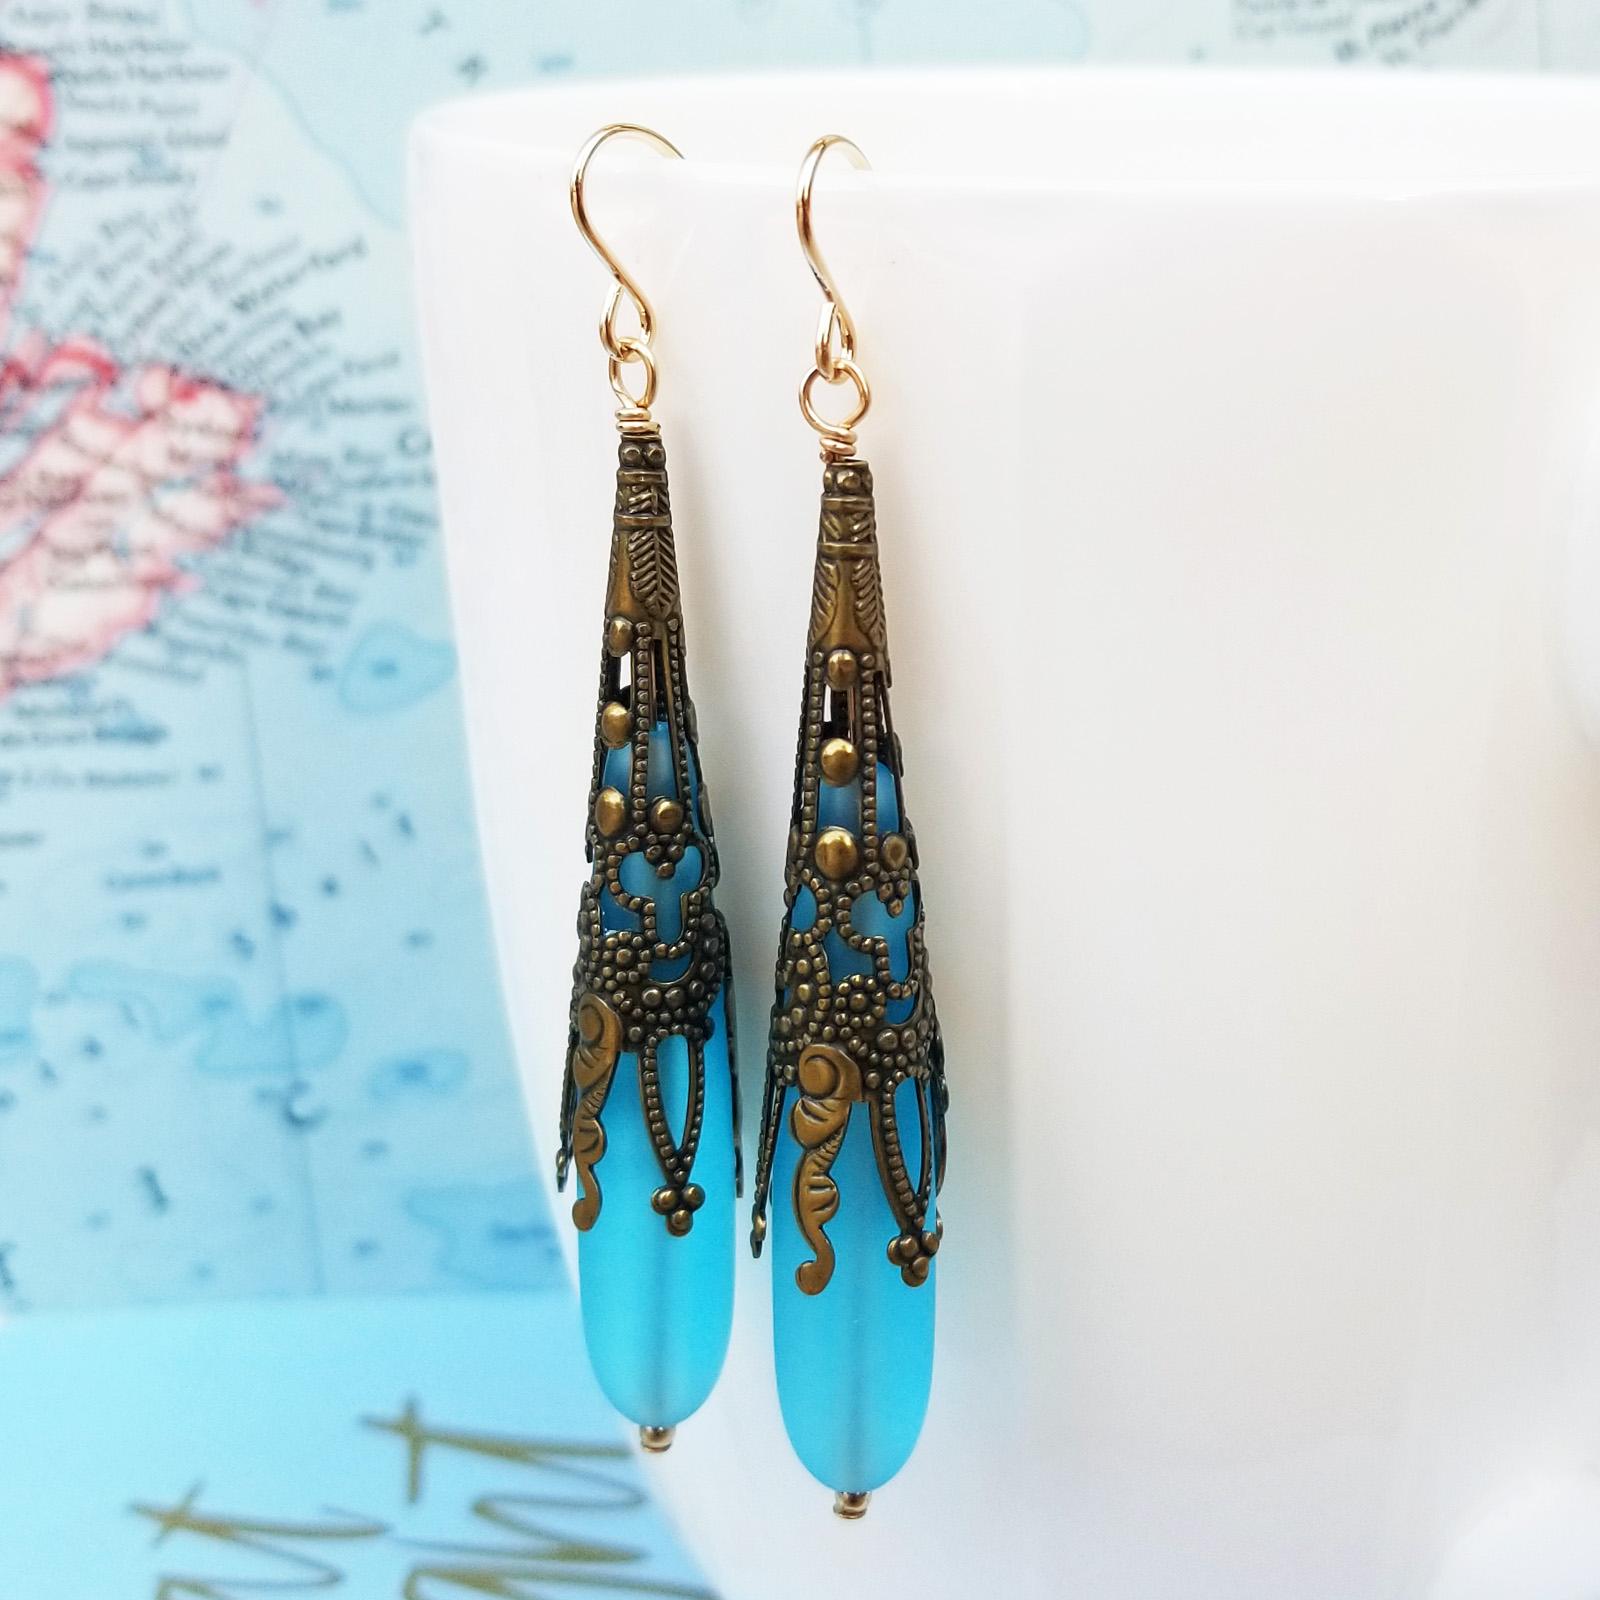 Aqua Call Me Vintage Sea Glass and Brass Earrings